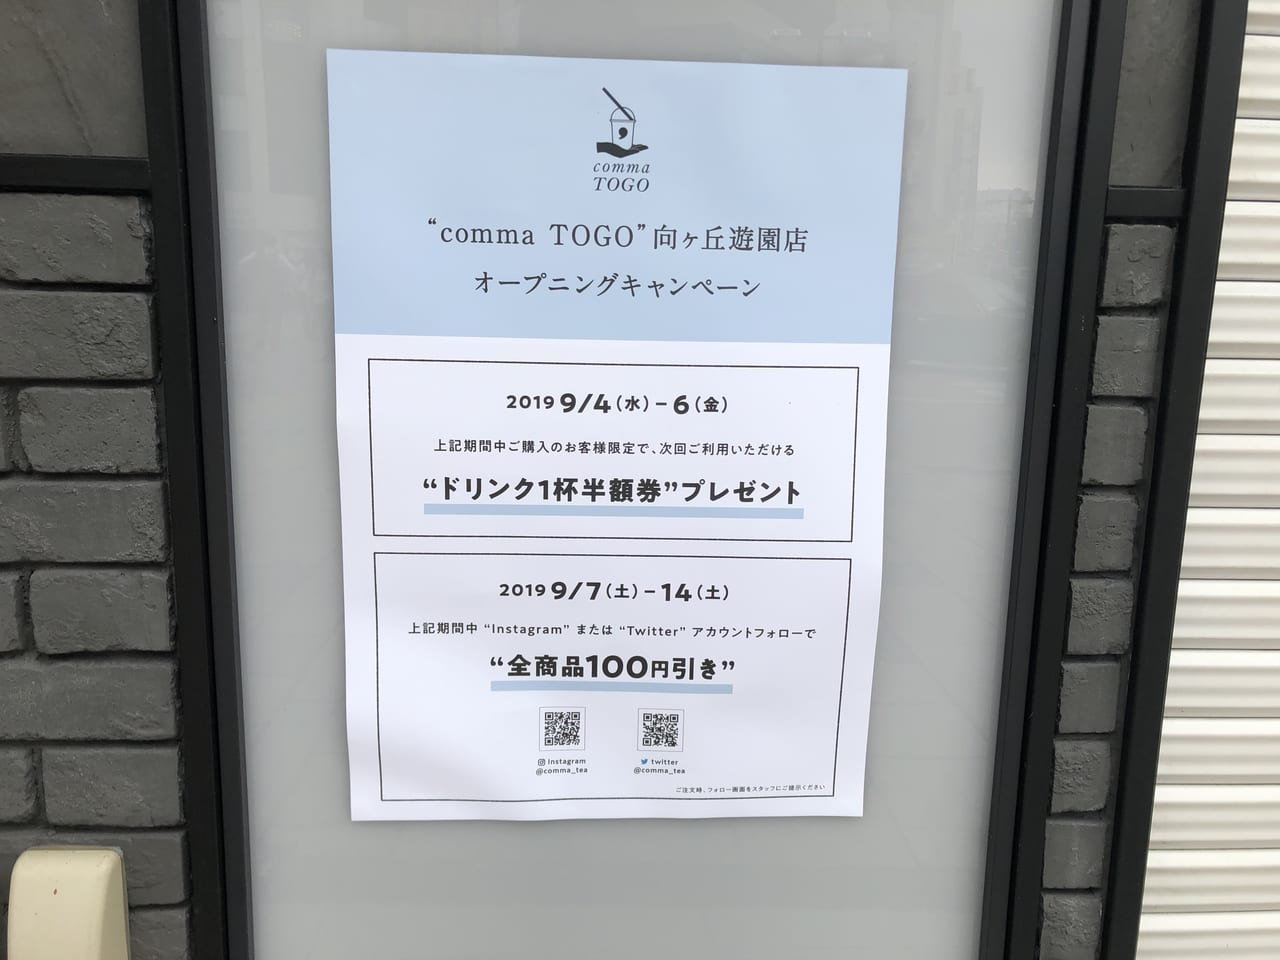 commaTOGOオープンキャンペーン(2019年撮影)